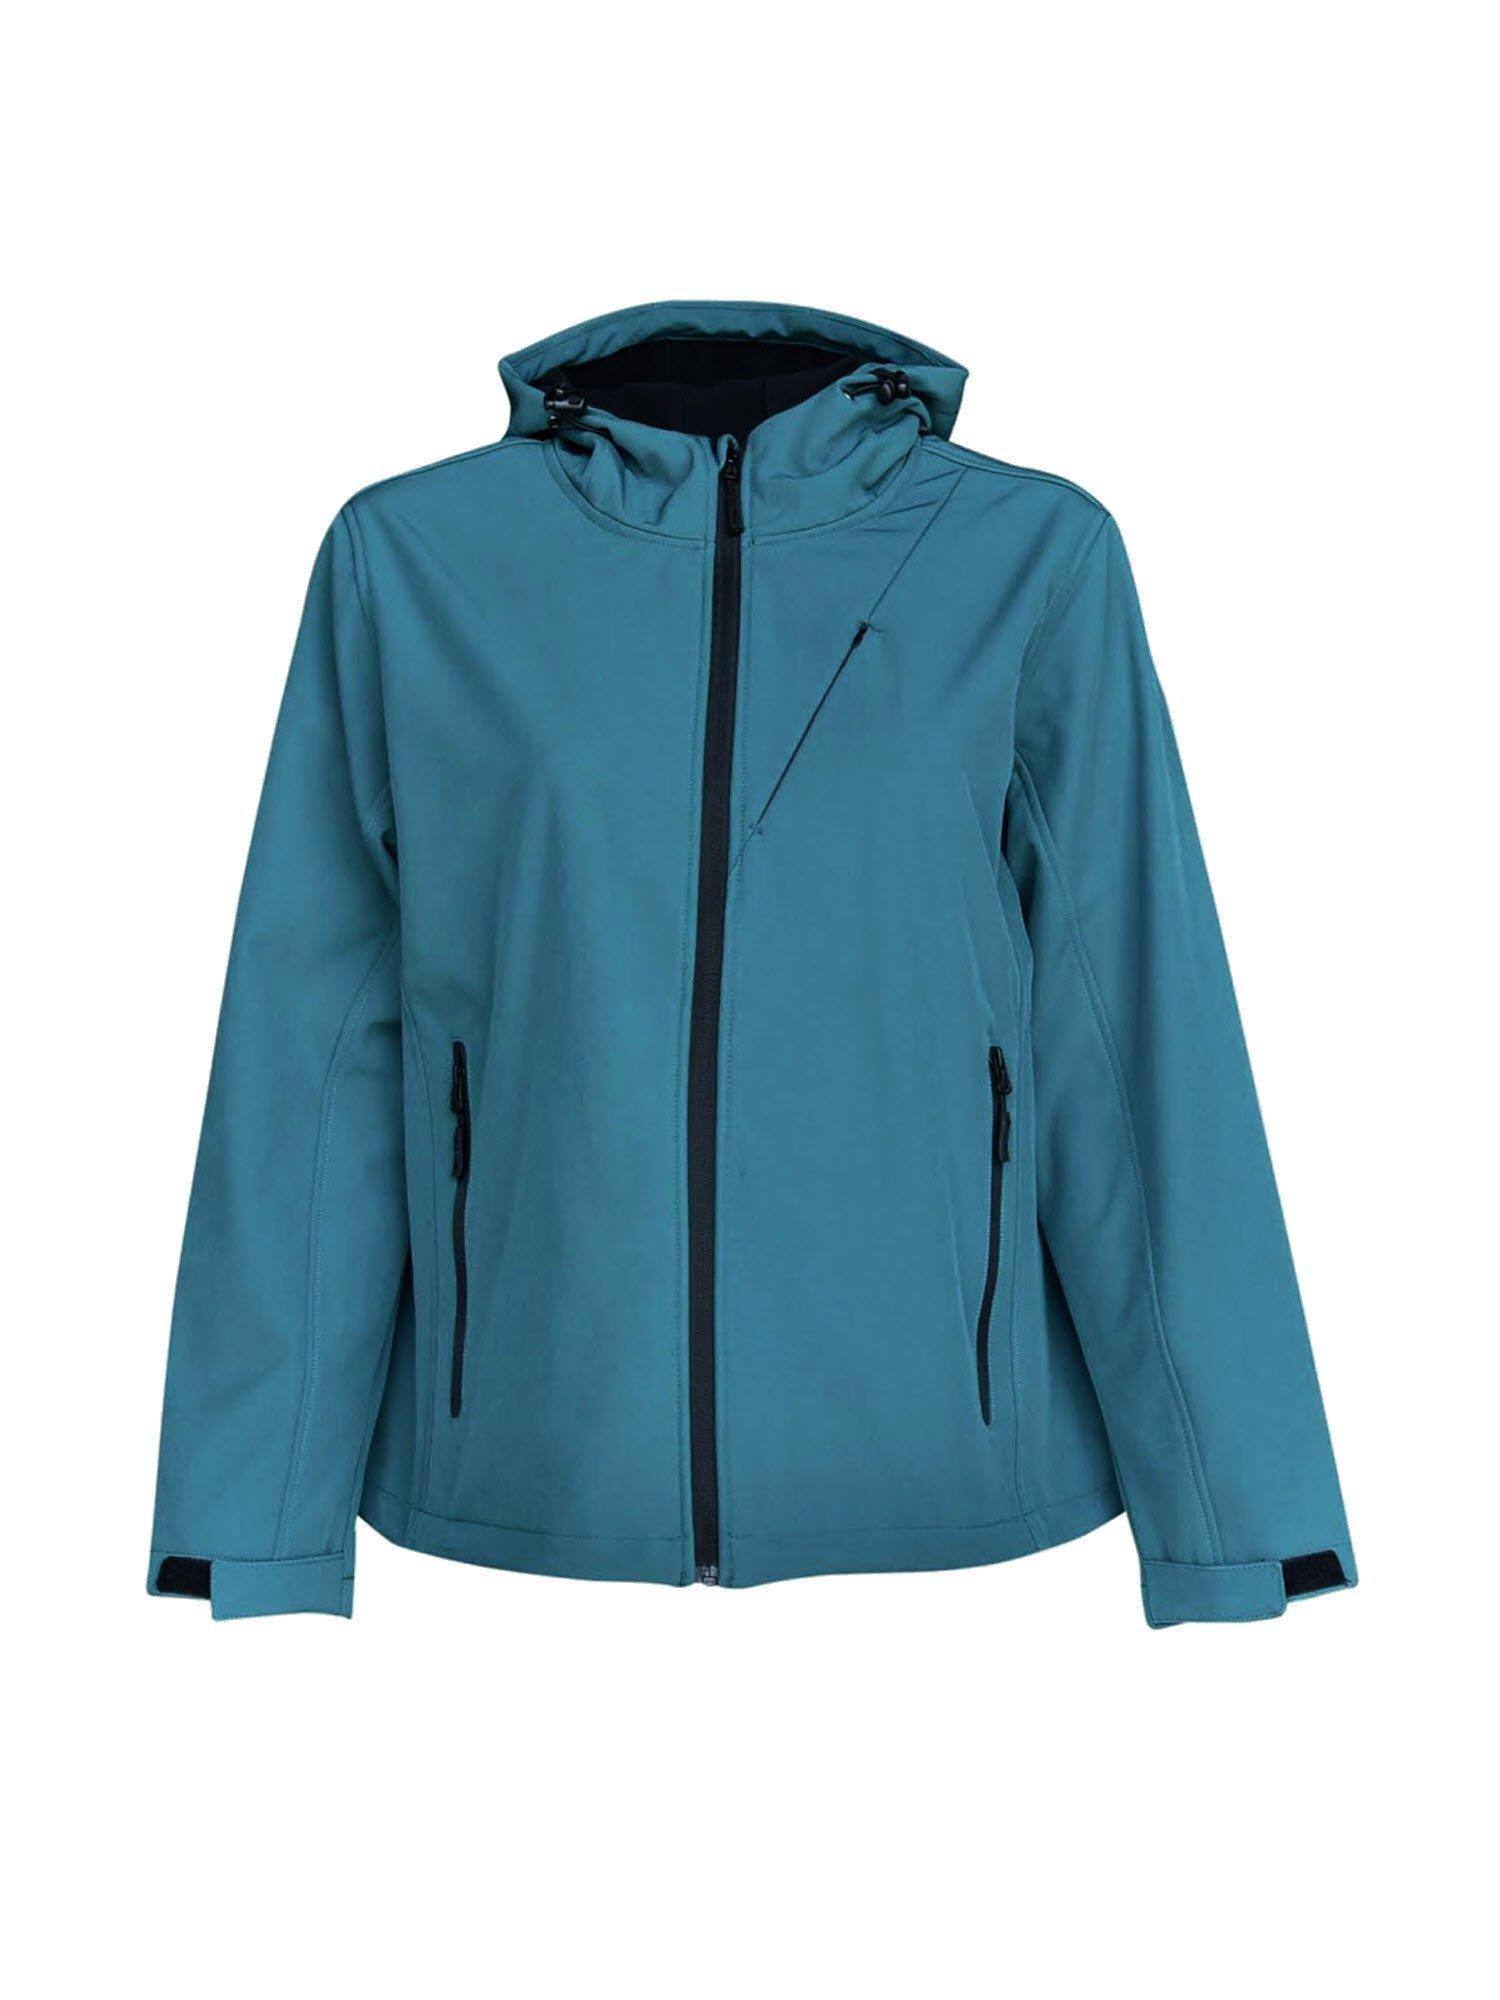 Pulse Women's Plus Size Hooded Soft Shell Jacket 1X-6X